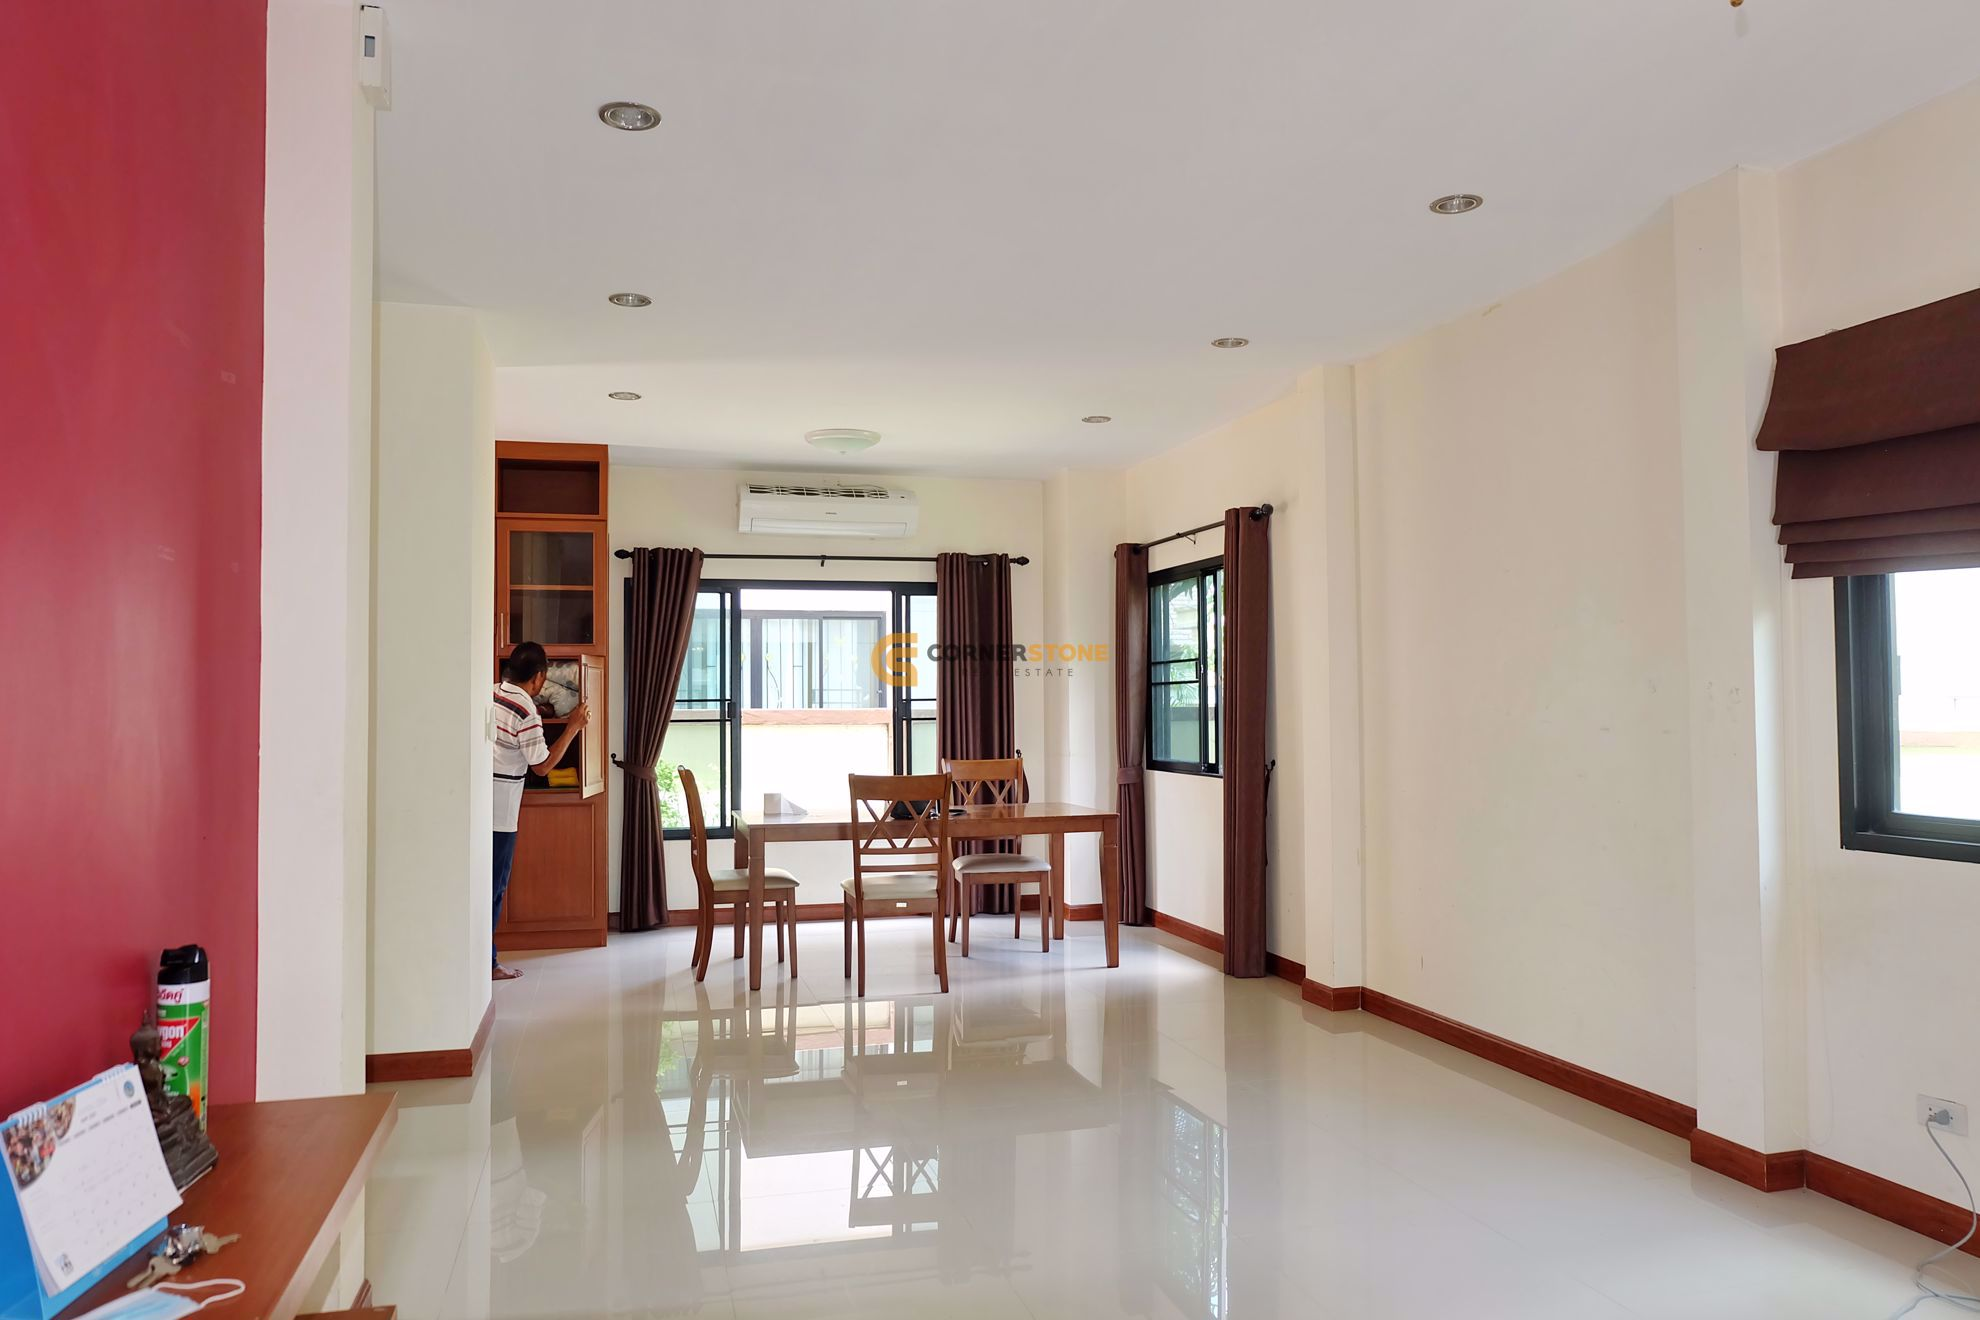 3 bedroom House in Baan Sirin East Pattaya